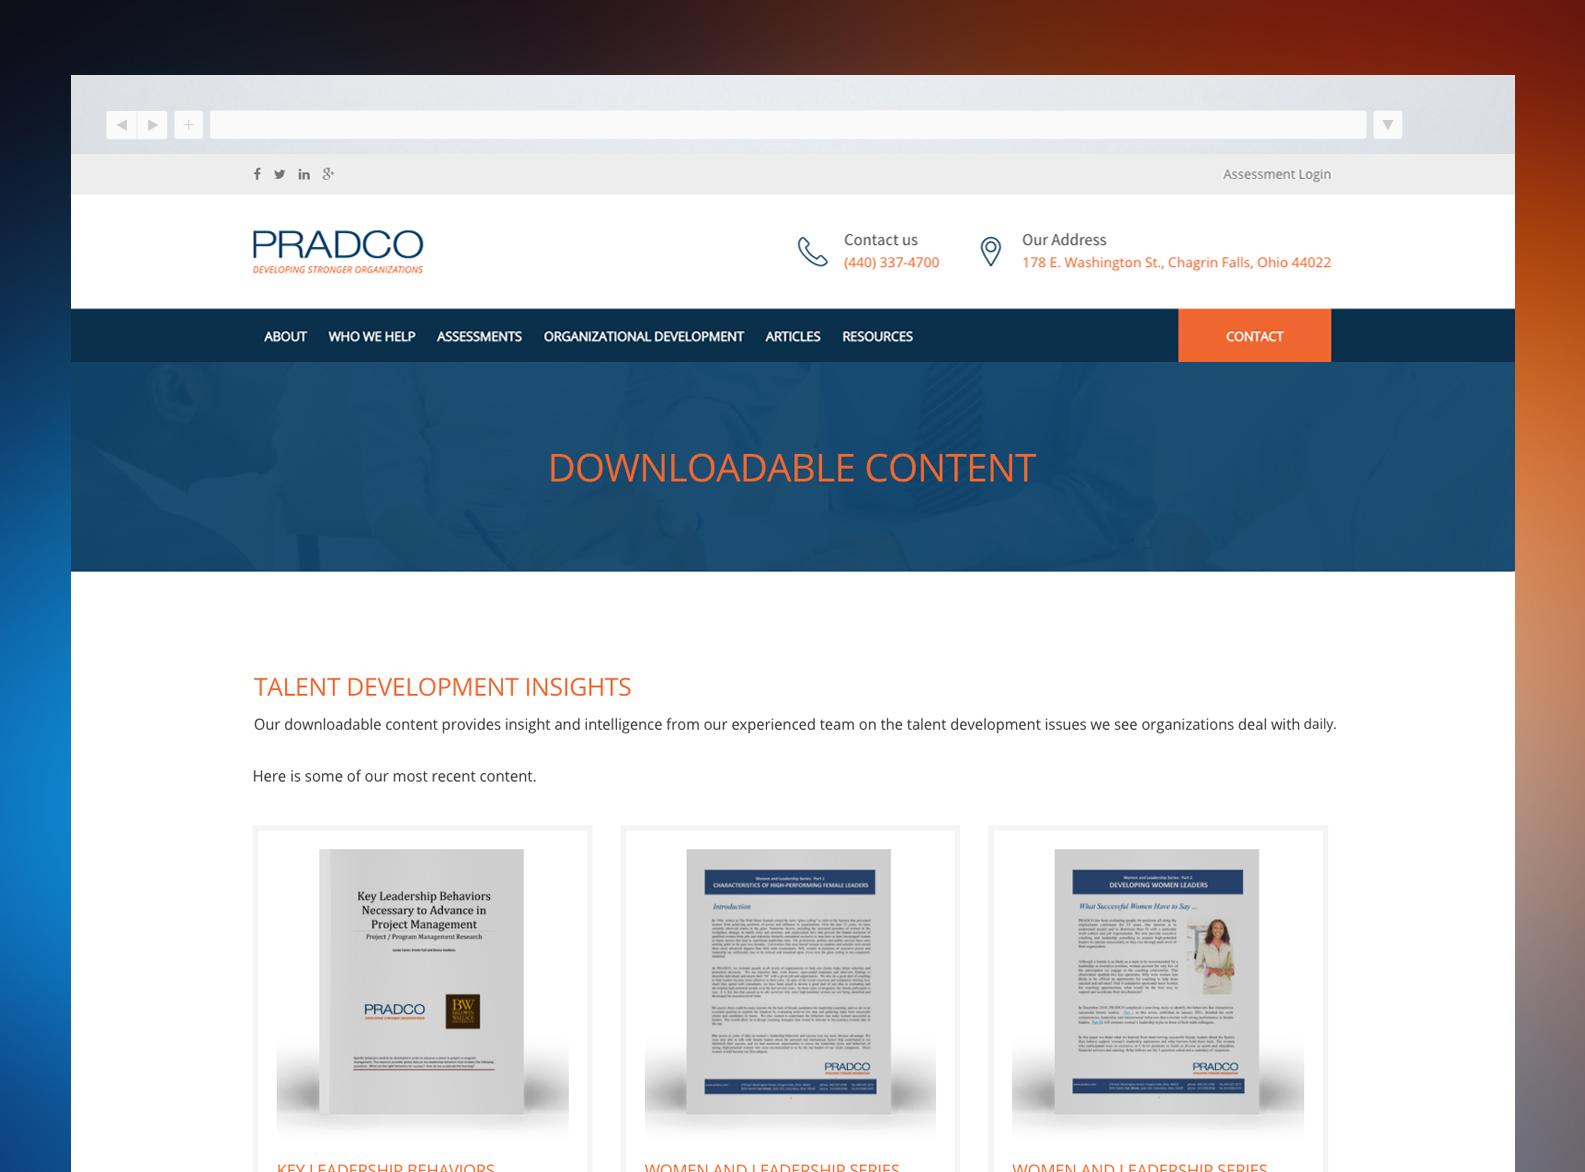 PRADCO Website Resources